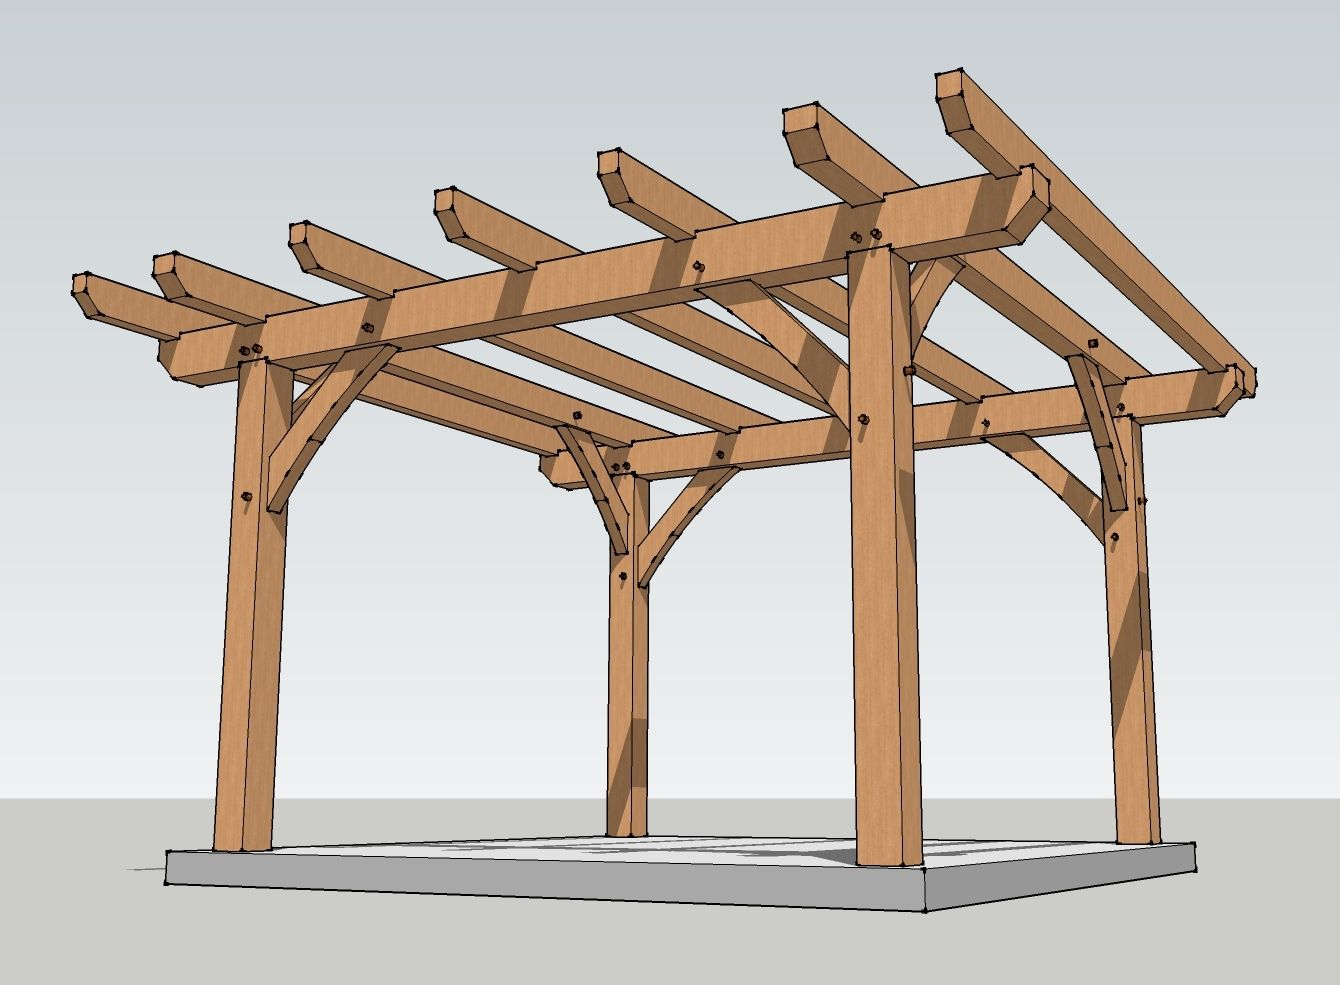 12x12 Timber Frame Pergola Diy Pergola Plans Uk Modern Pergola